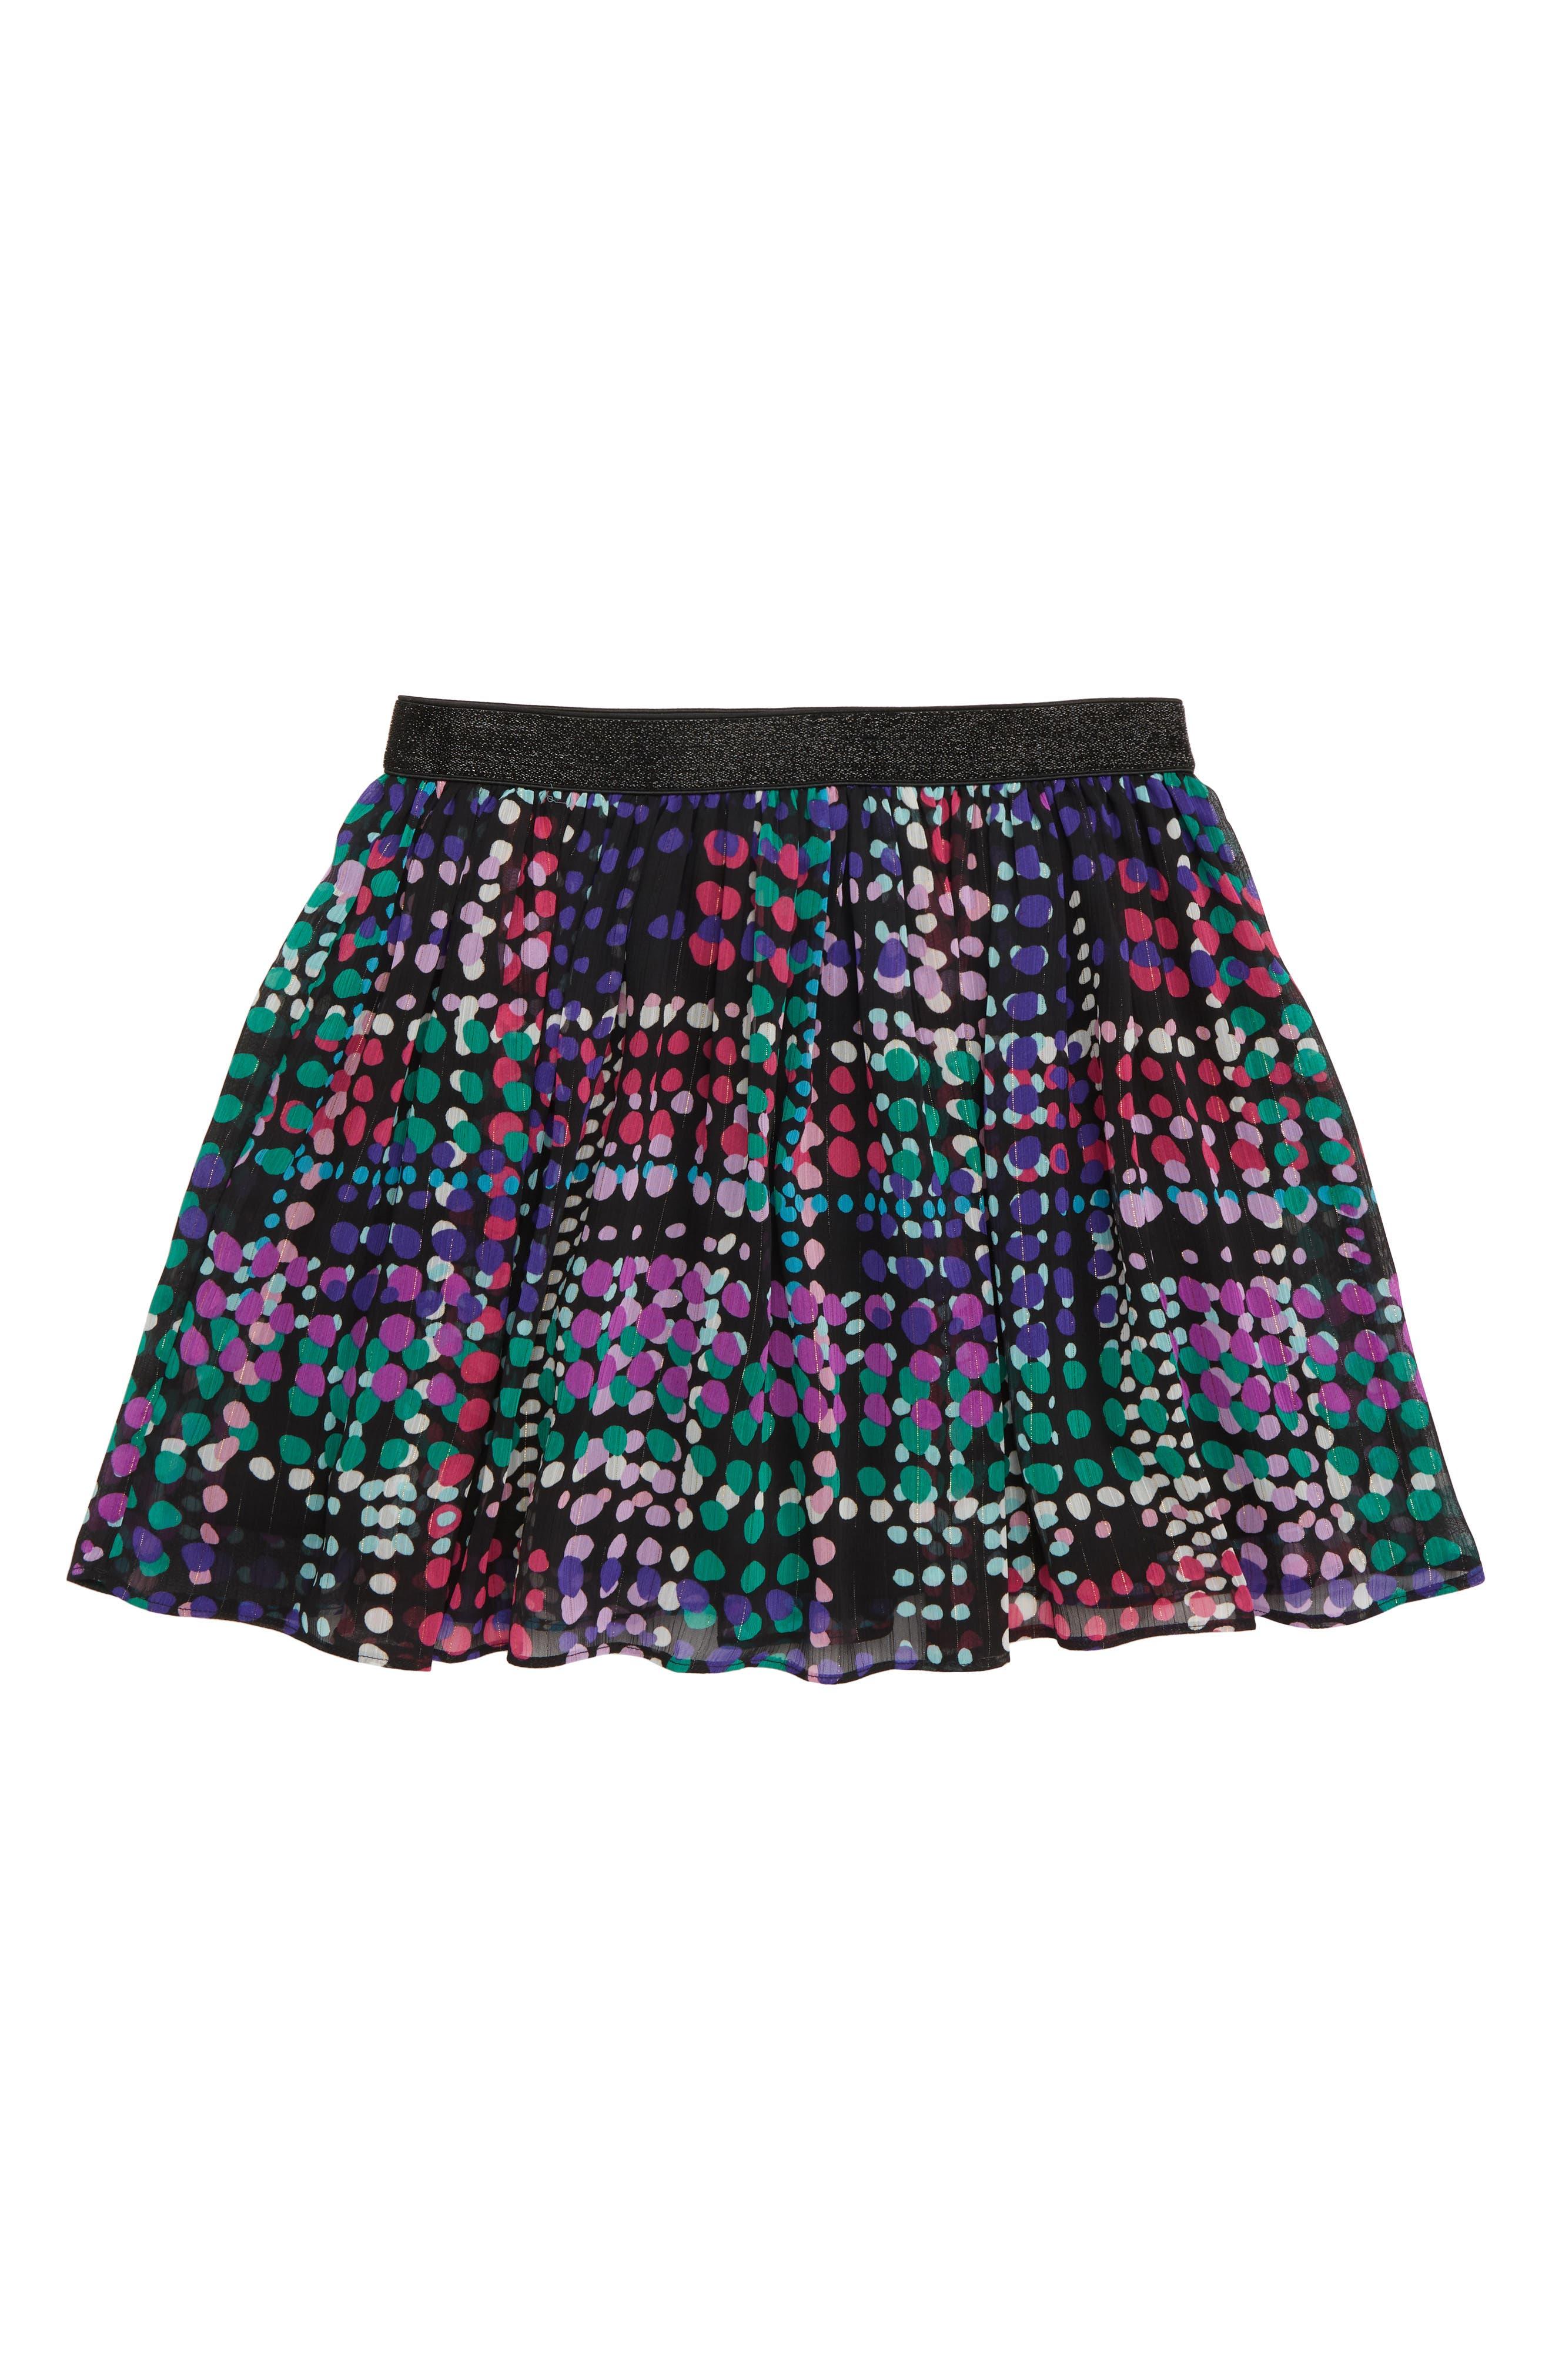 kate spade new york dotty skirt (Big Girls). $44.00. Product Image. Gift Wrap Available  sc 1 st  Nordstrom & kat | Nordstrom